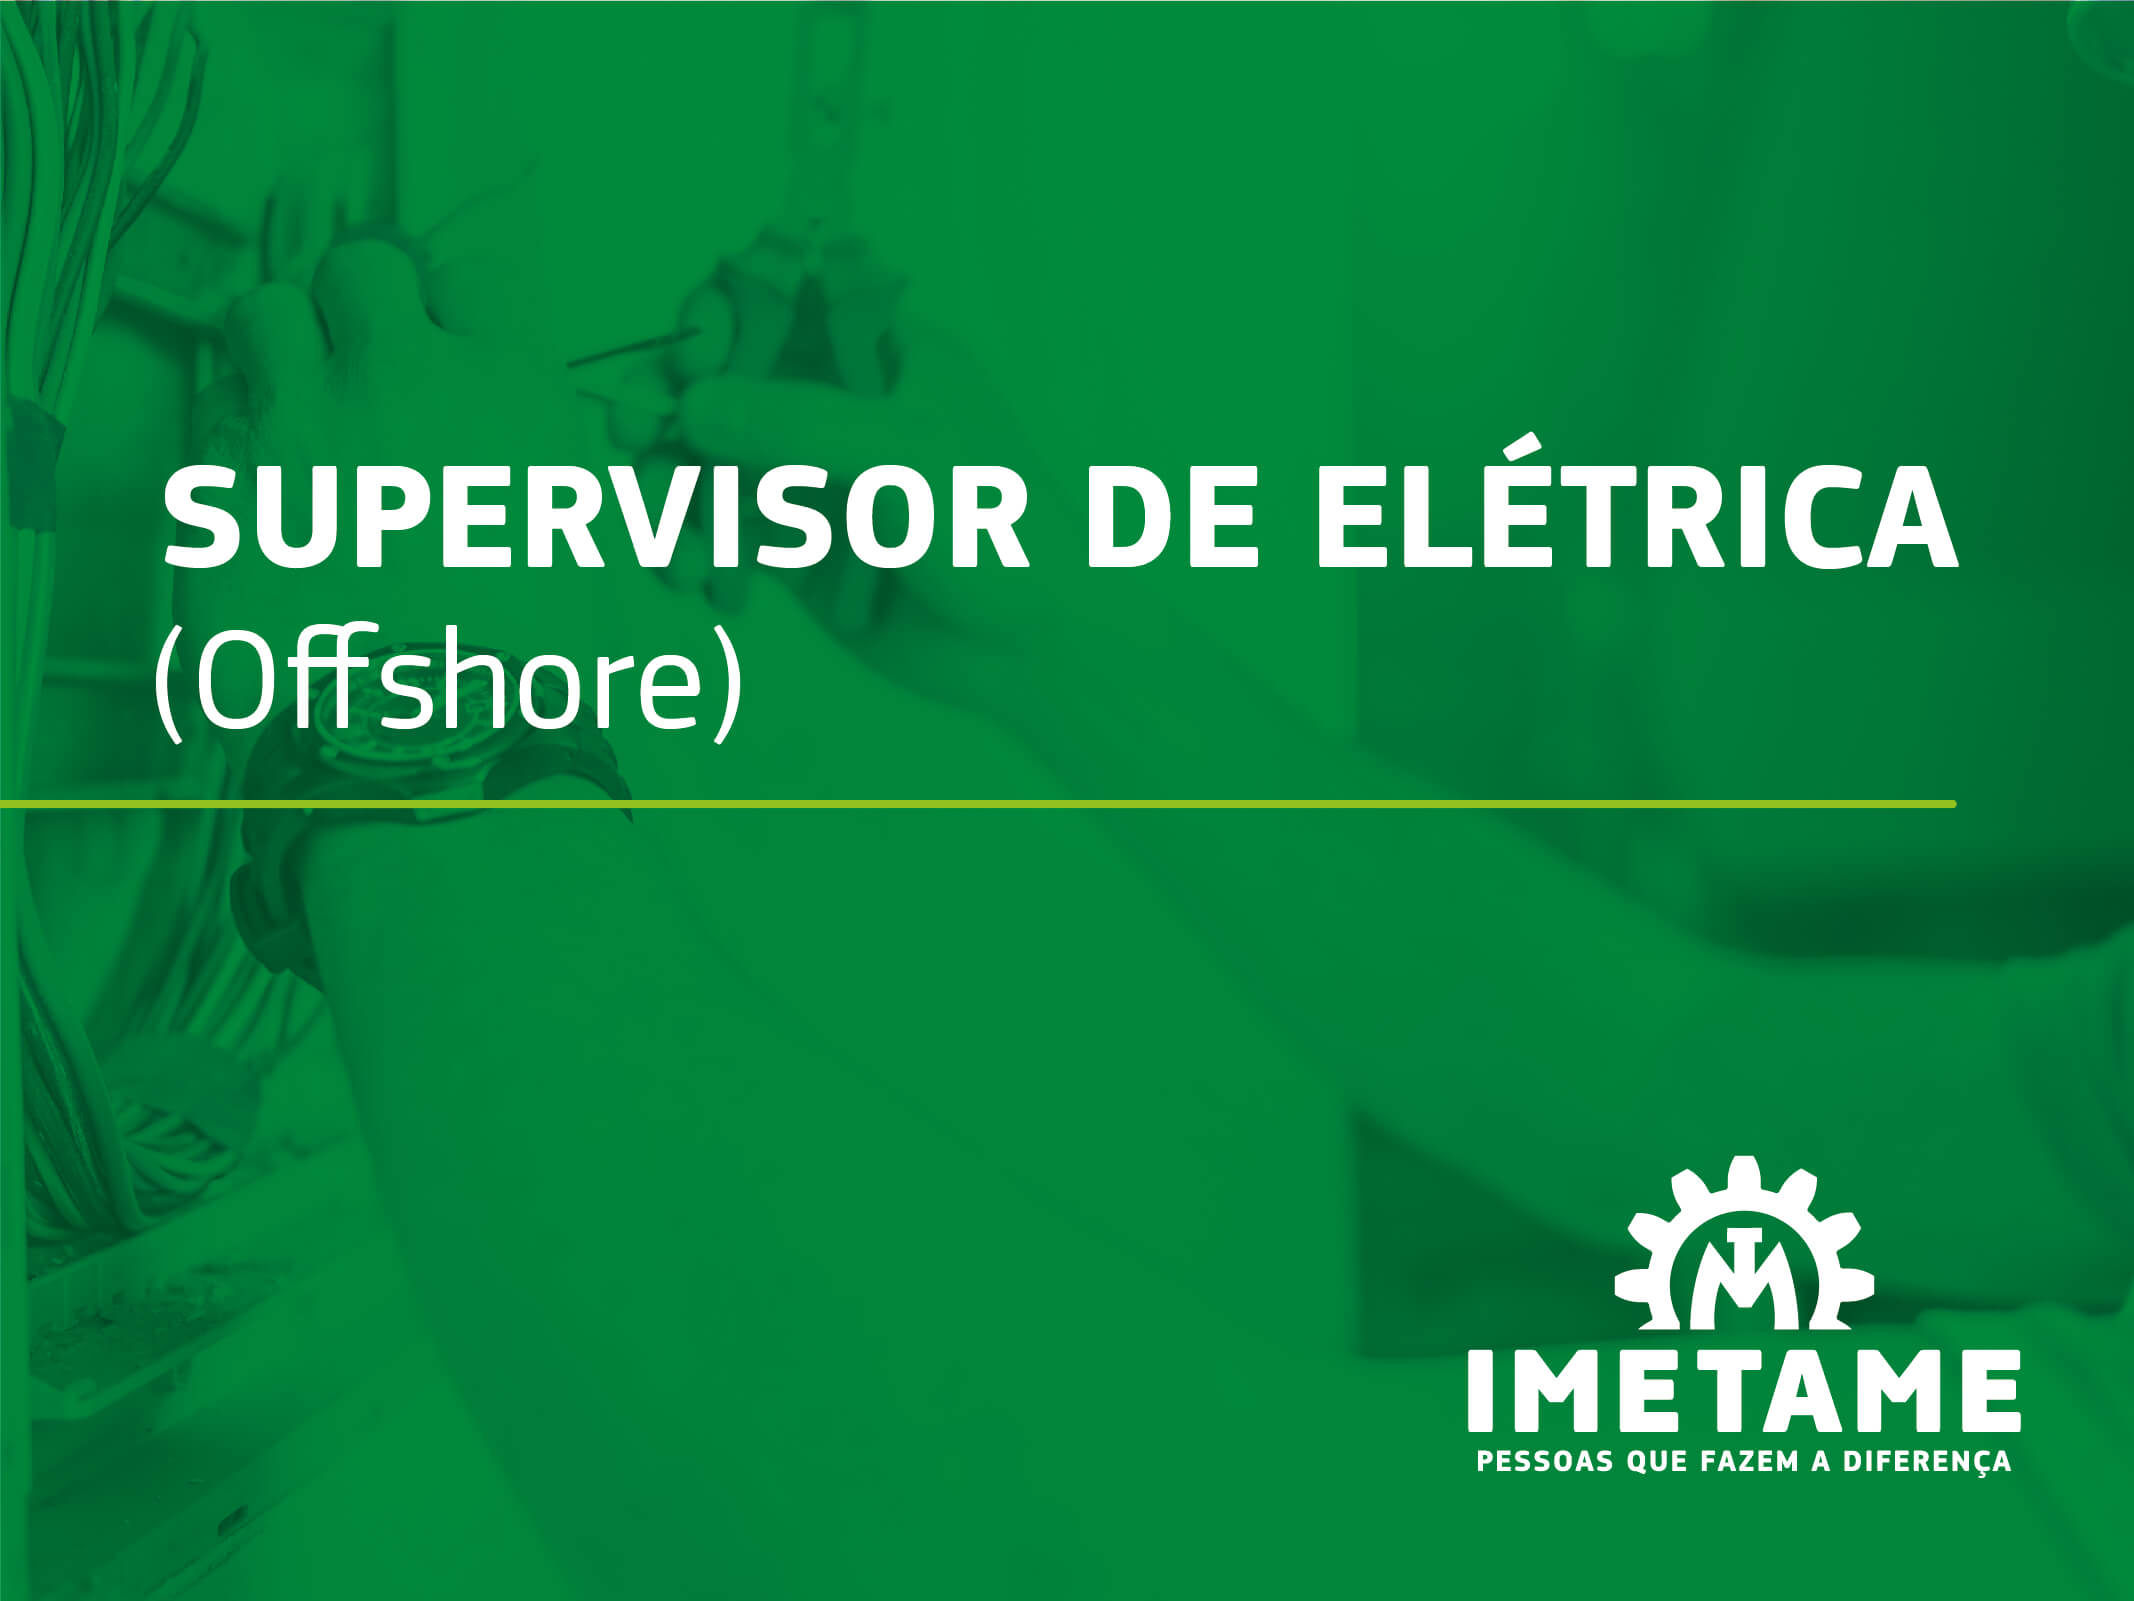 Supervisor de Elétrica – Offshore